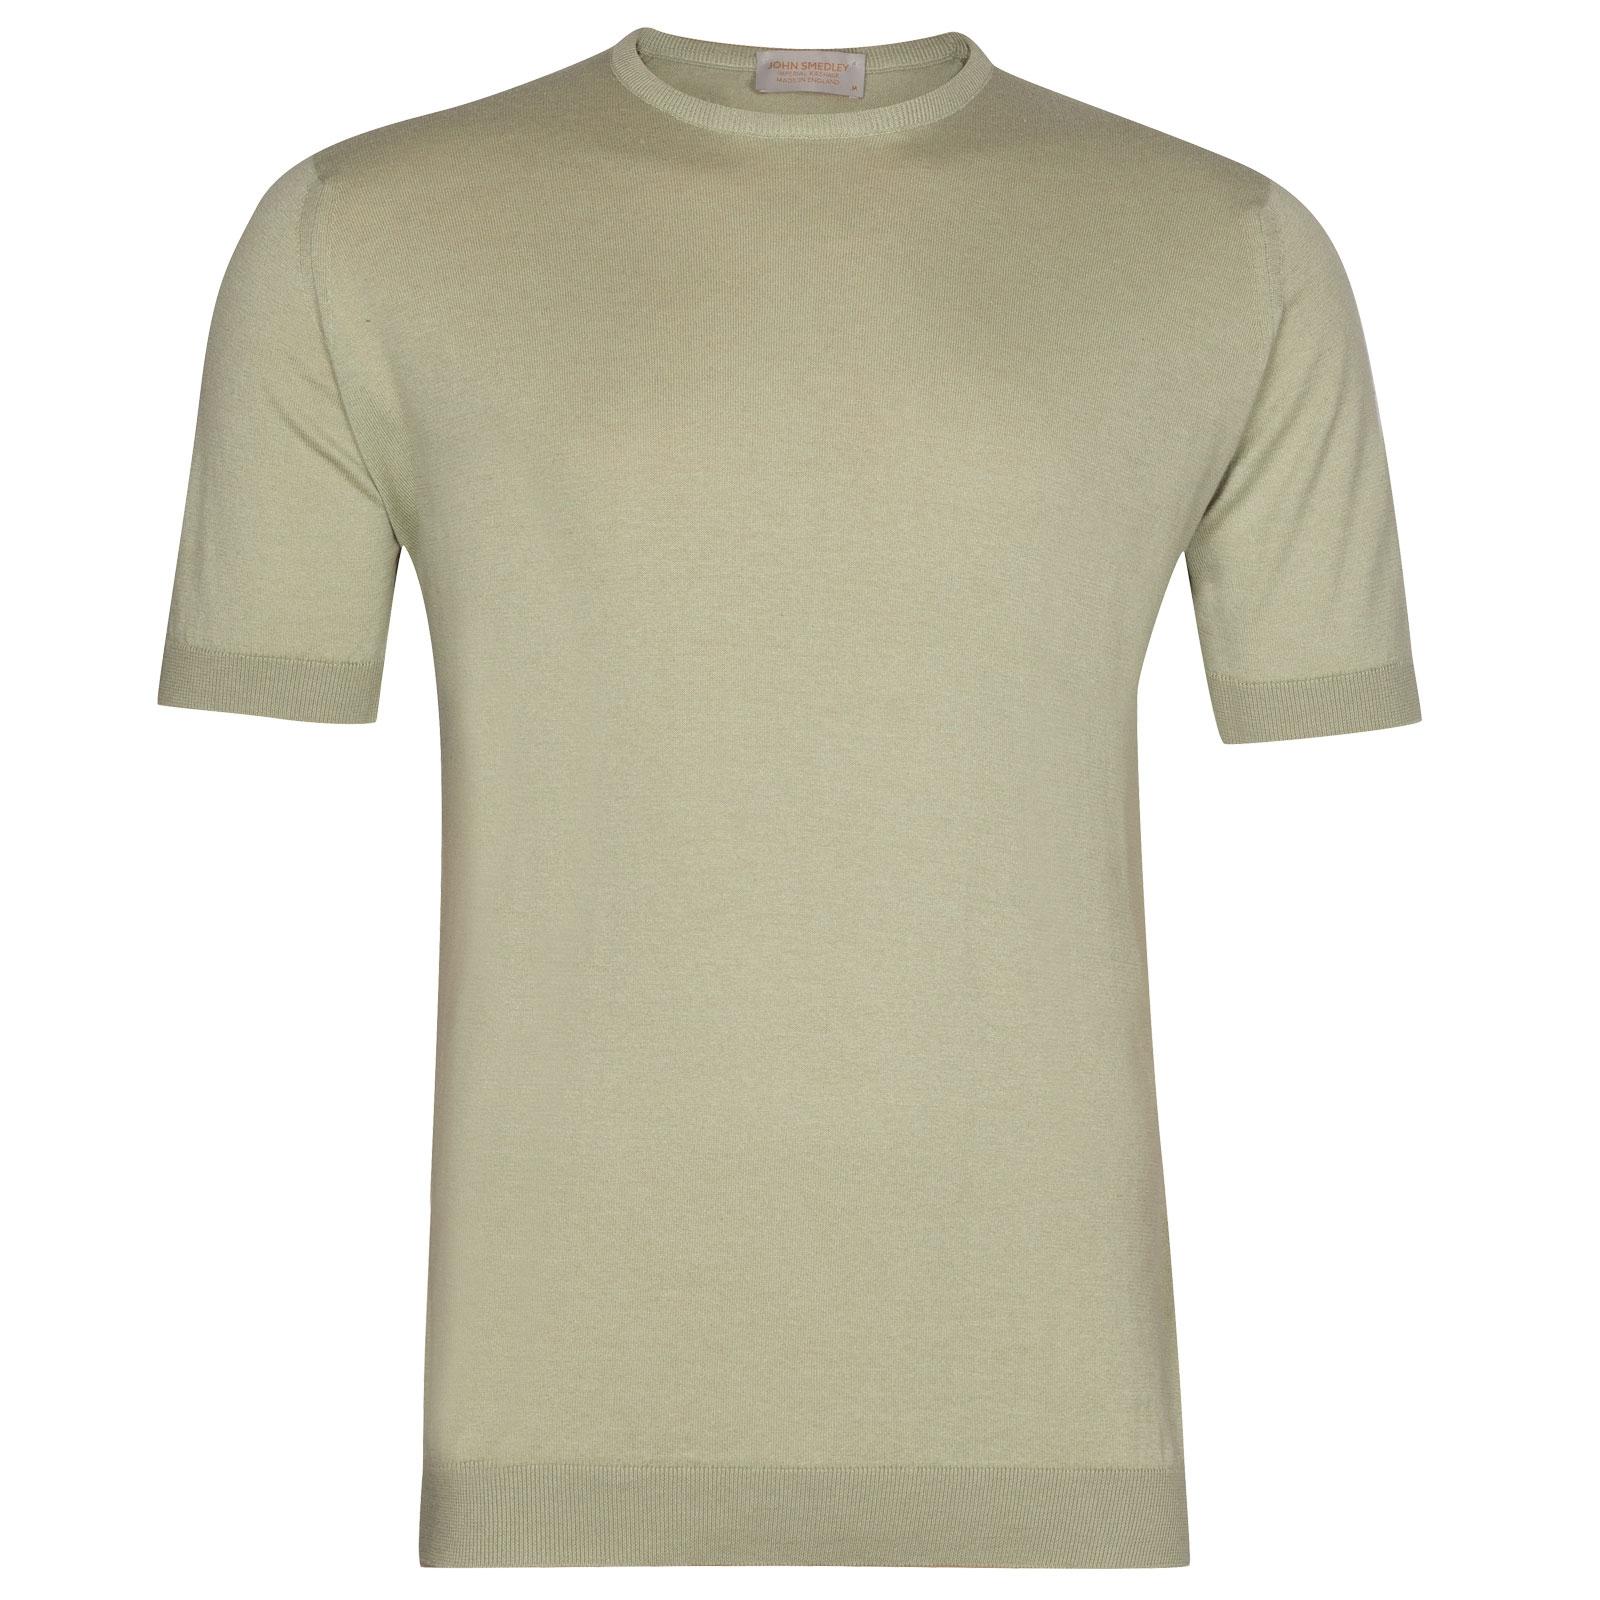 John Smedley Stonwell in Burlap Green T-Shirt-XXL